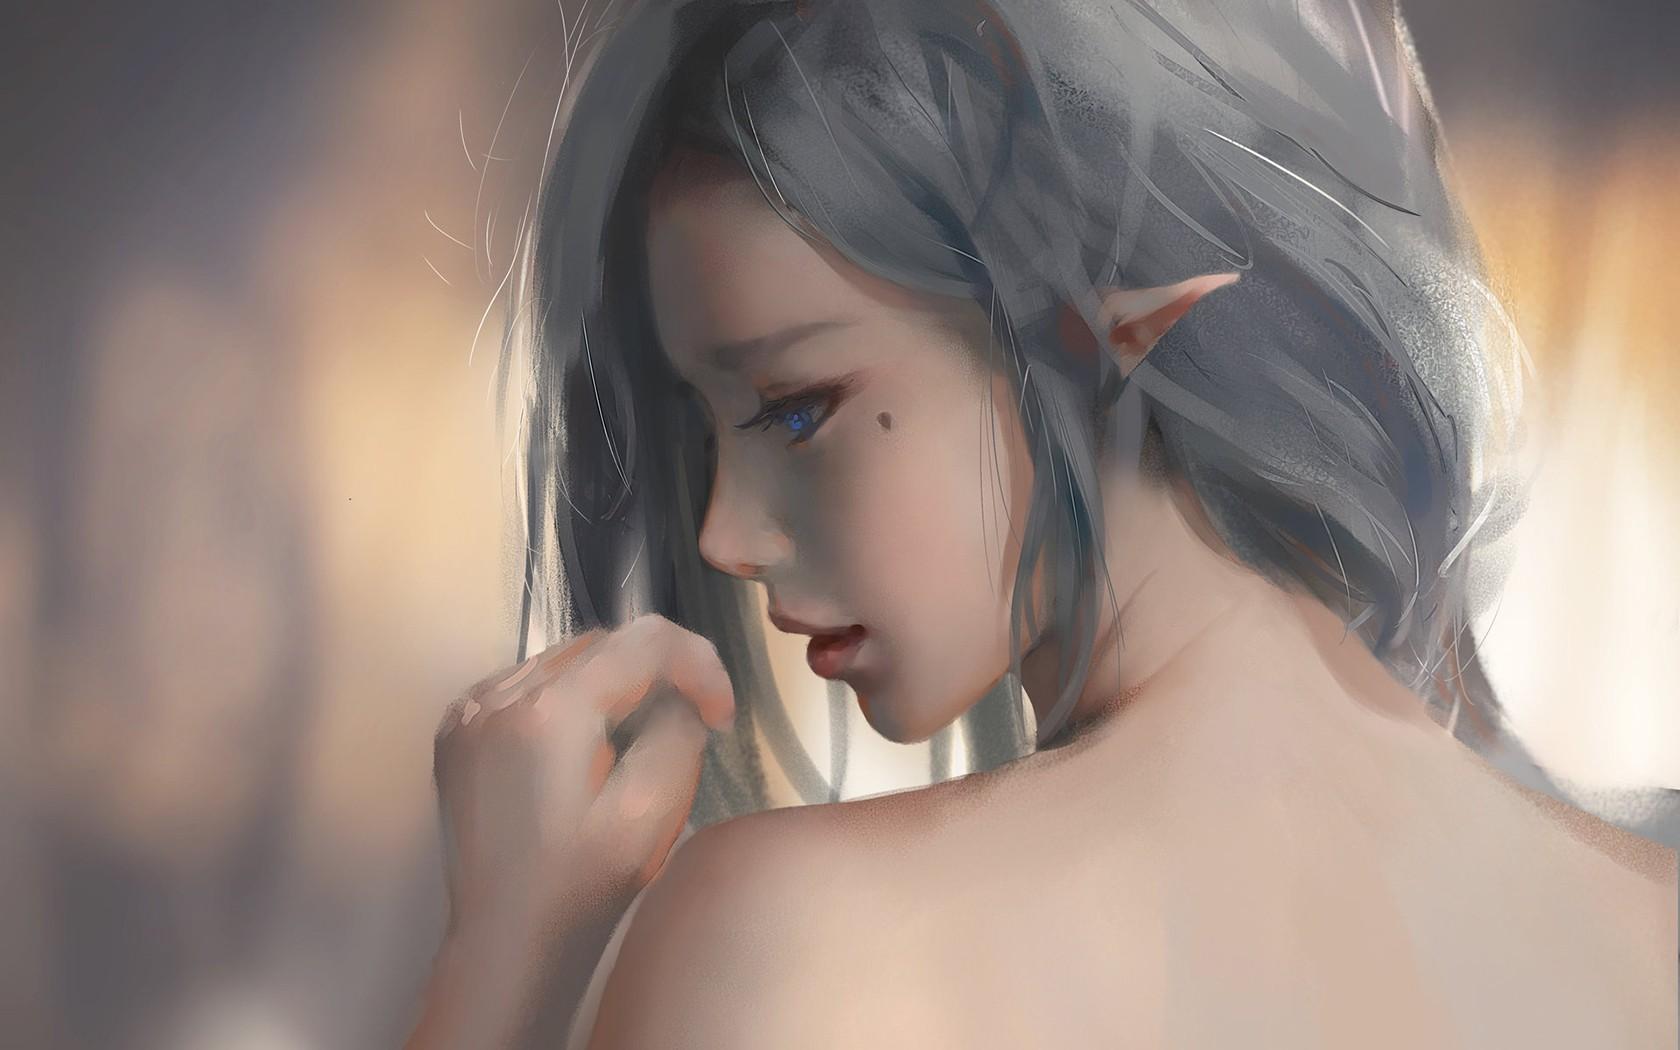 Brown Hair Fantasy Girl Art